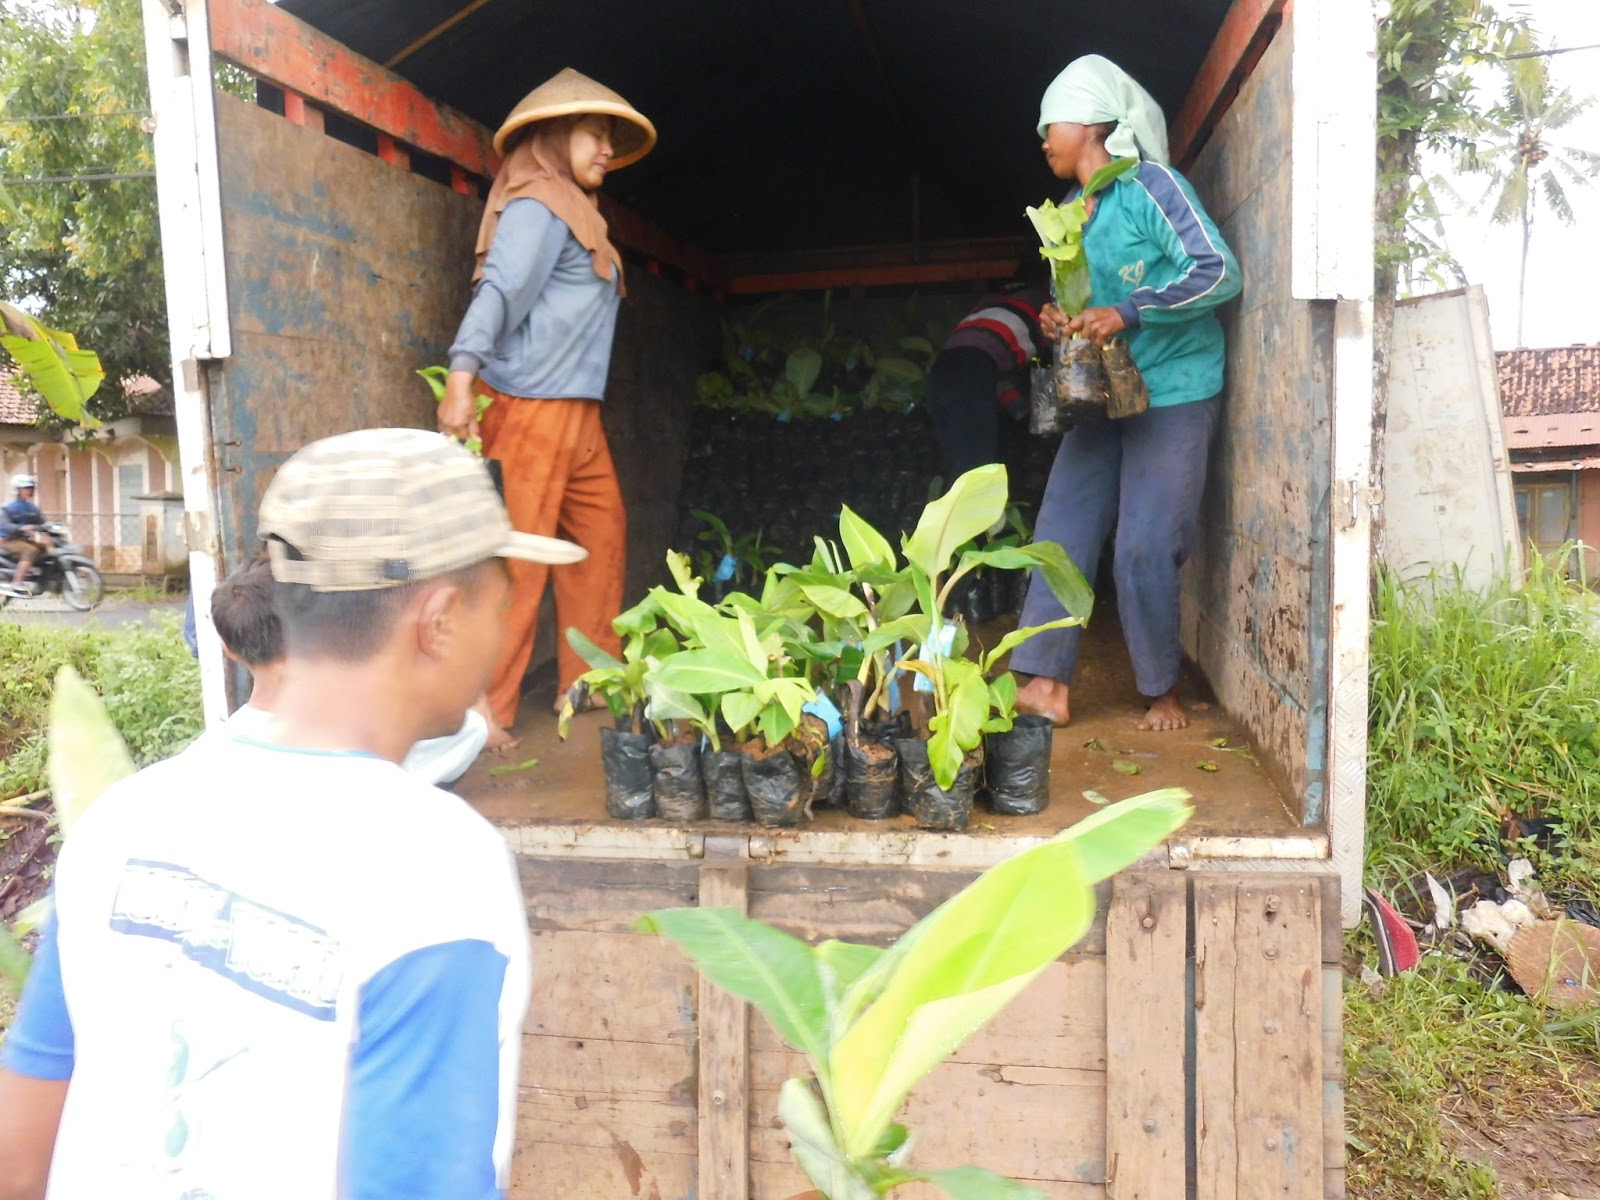 Cv Wahyu Tani Putra Januari 2013 Keripik Rumput Laut By Jawaria Pal Pengiriman Bibit Bermutu Bersertifikat